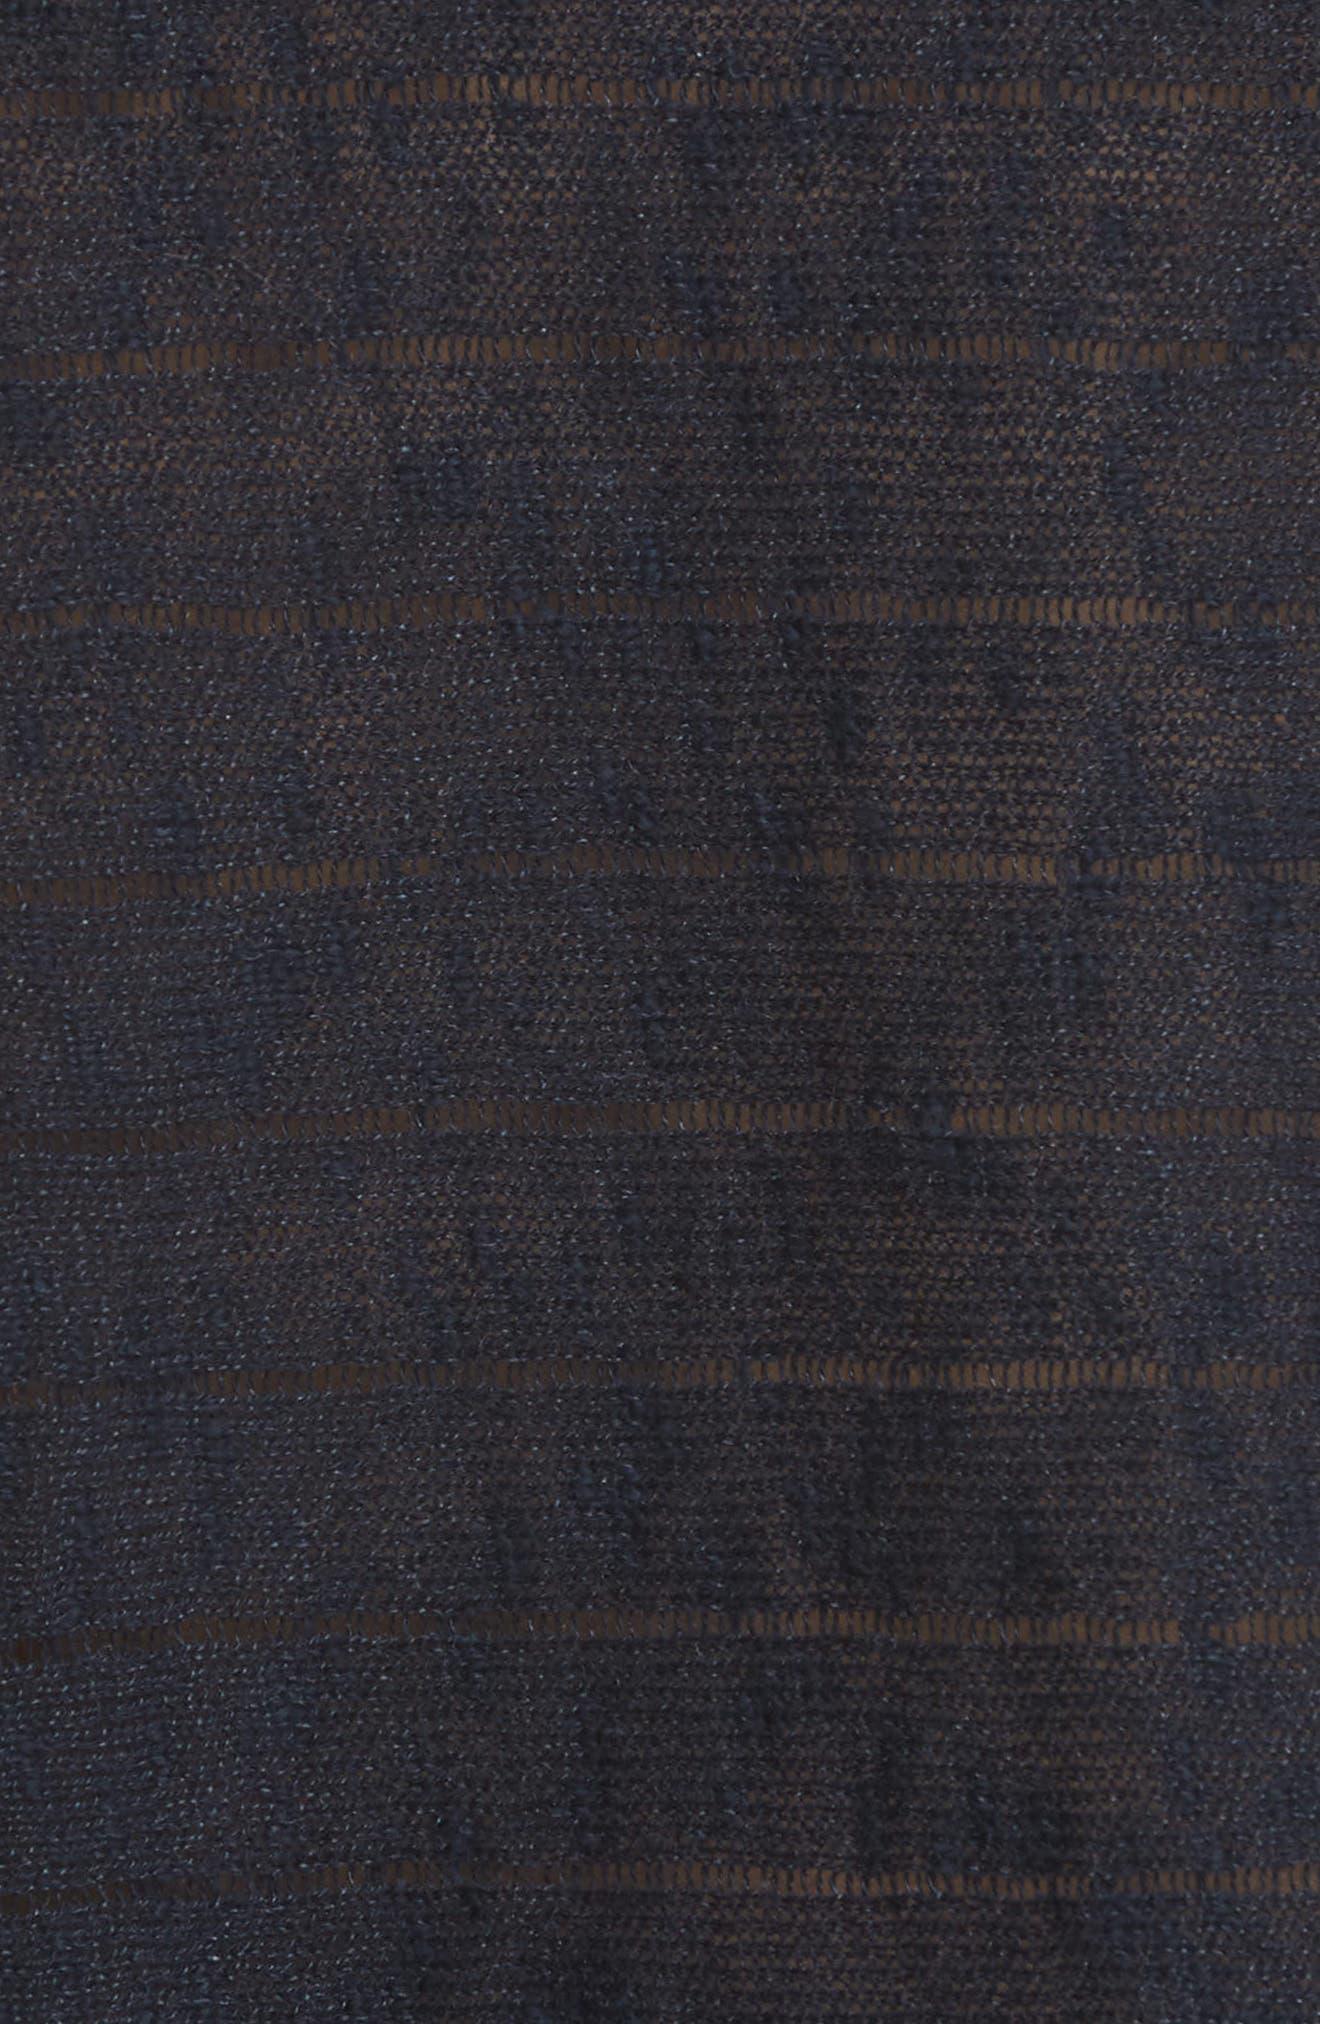 Ramie Cotton Sweater,                             Alternate thumbnail 5, color,                             306